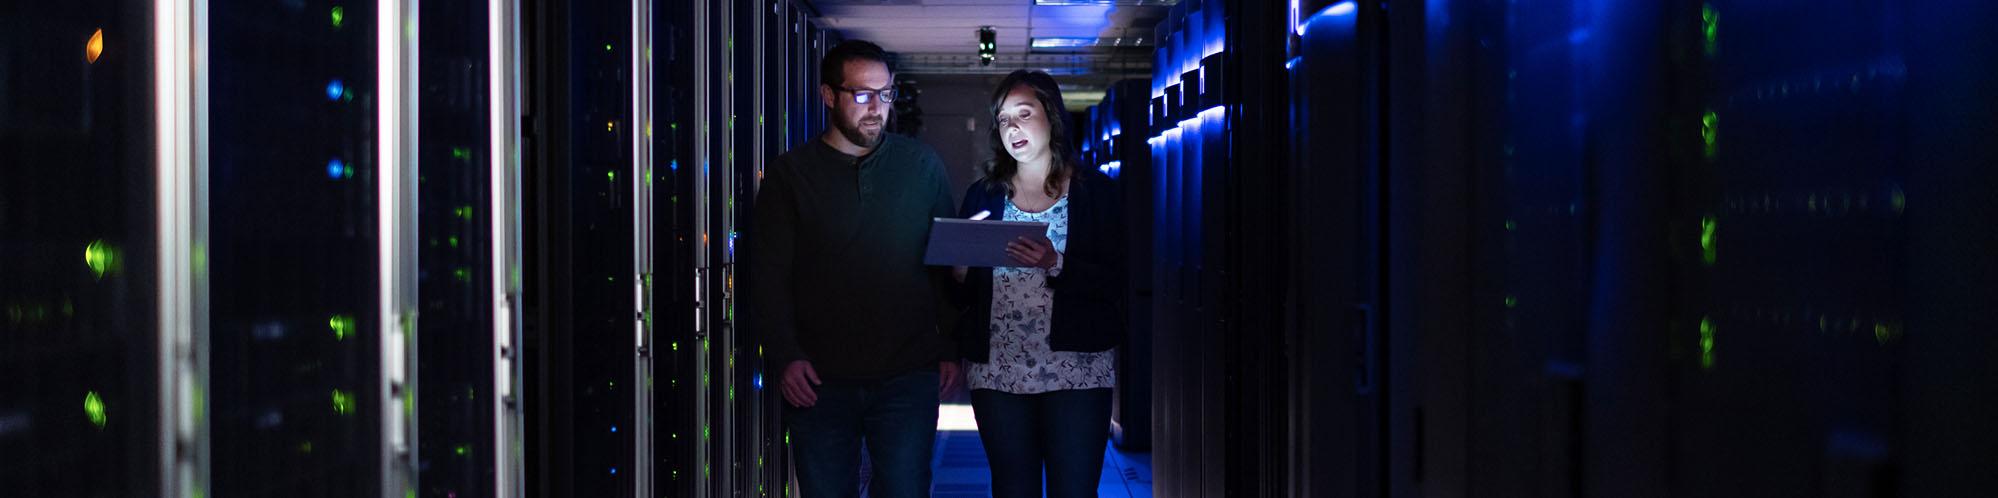 Woman showing man tablet near servers